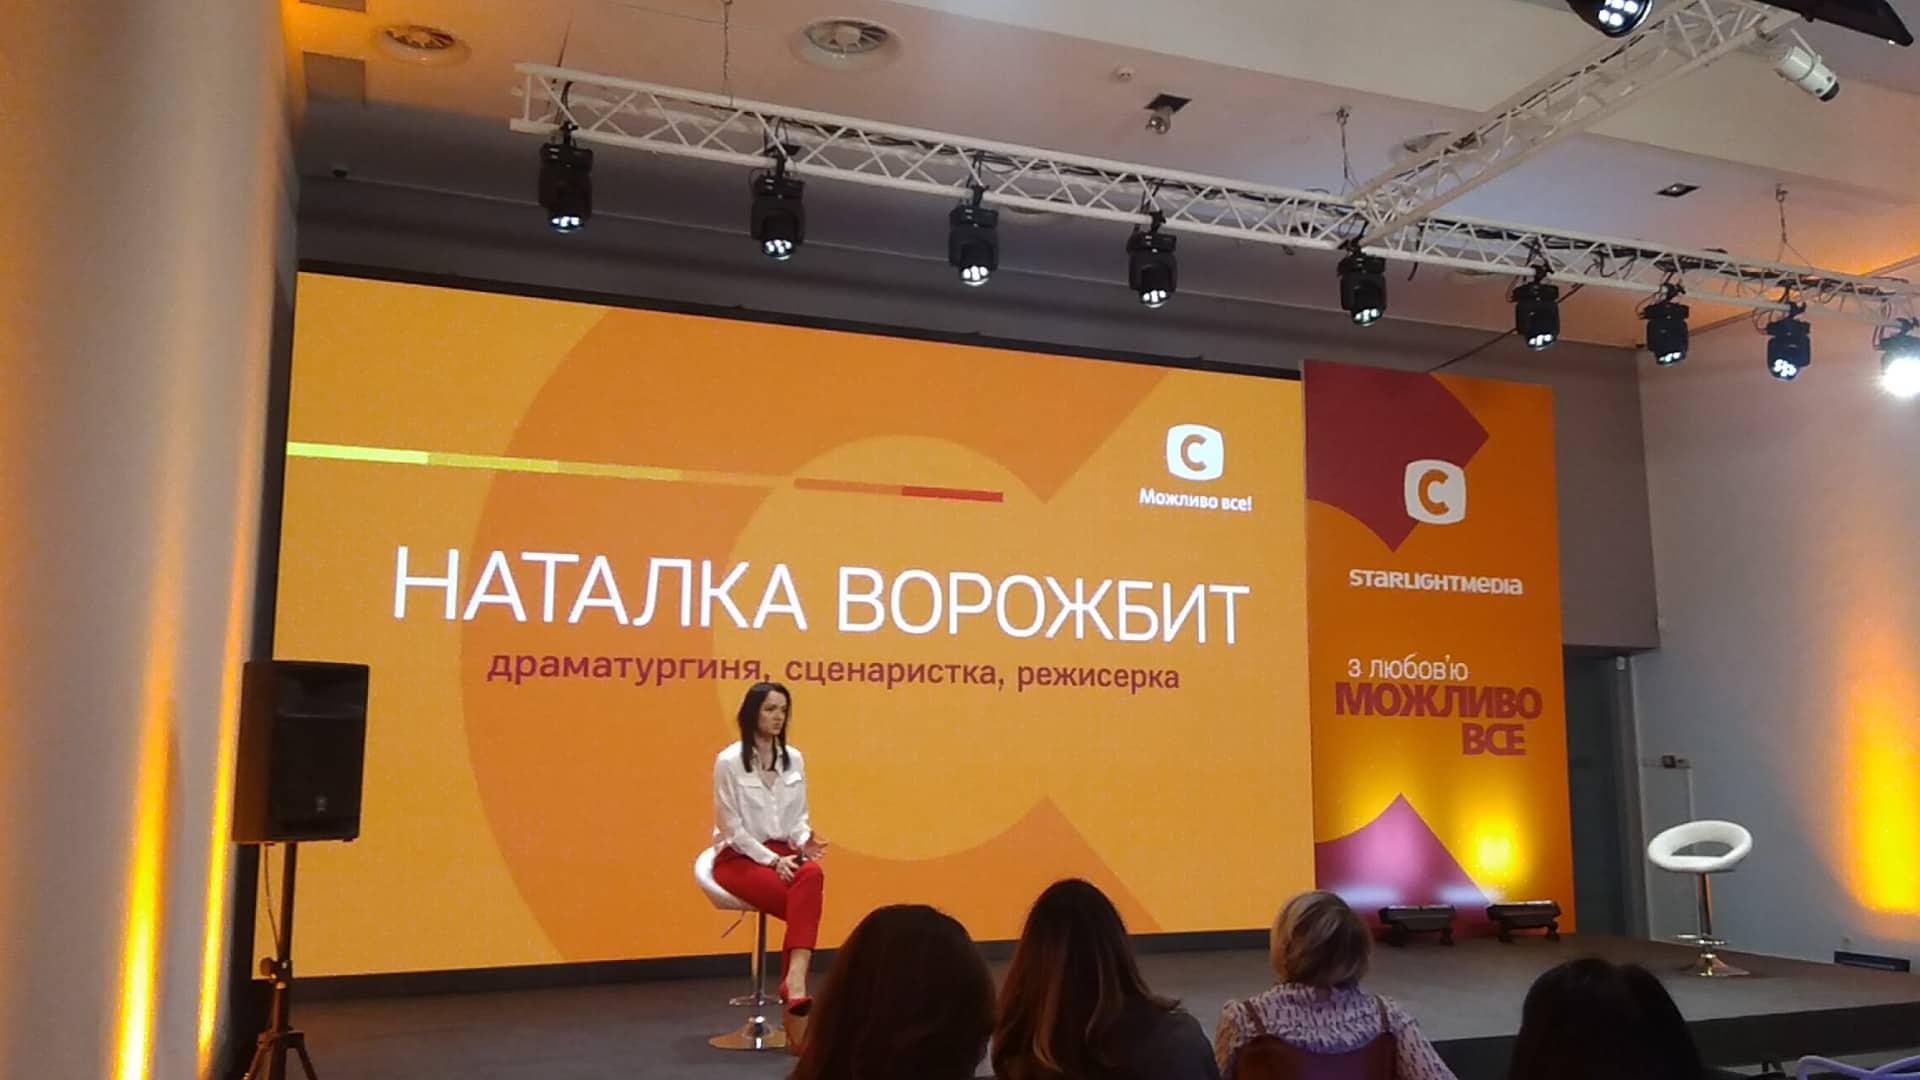 https://telekritika.ua/tk-static/2020/01/vorozhbit-natalja-01-23-2020.jpg